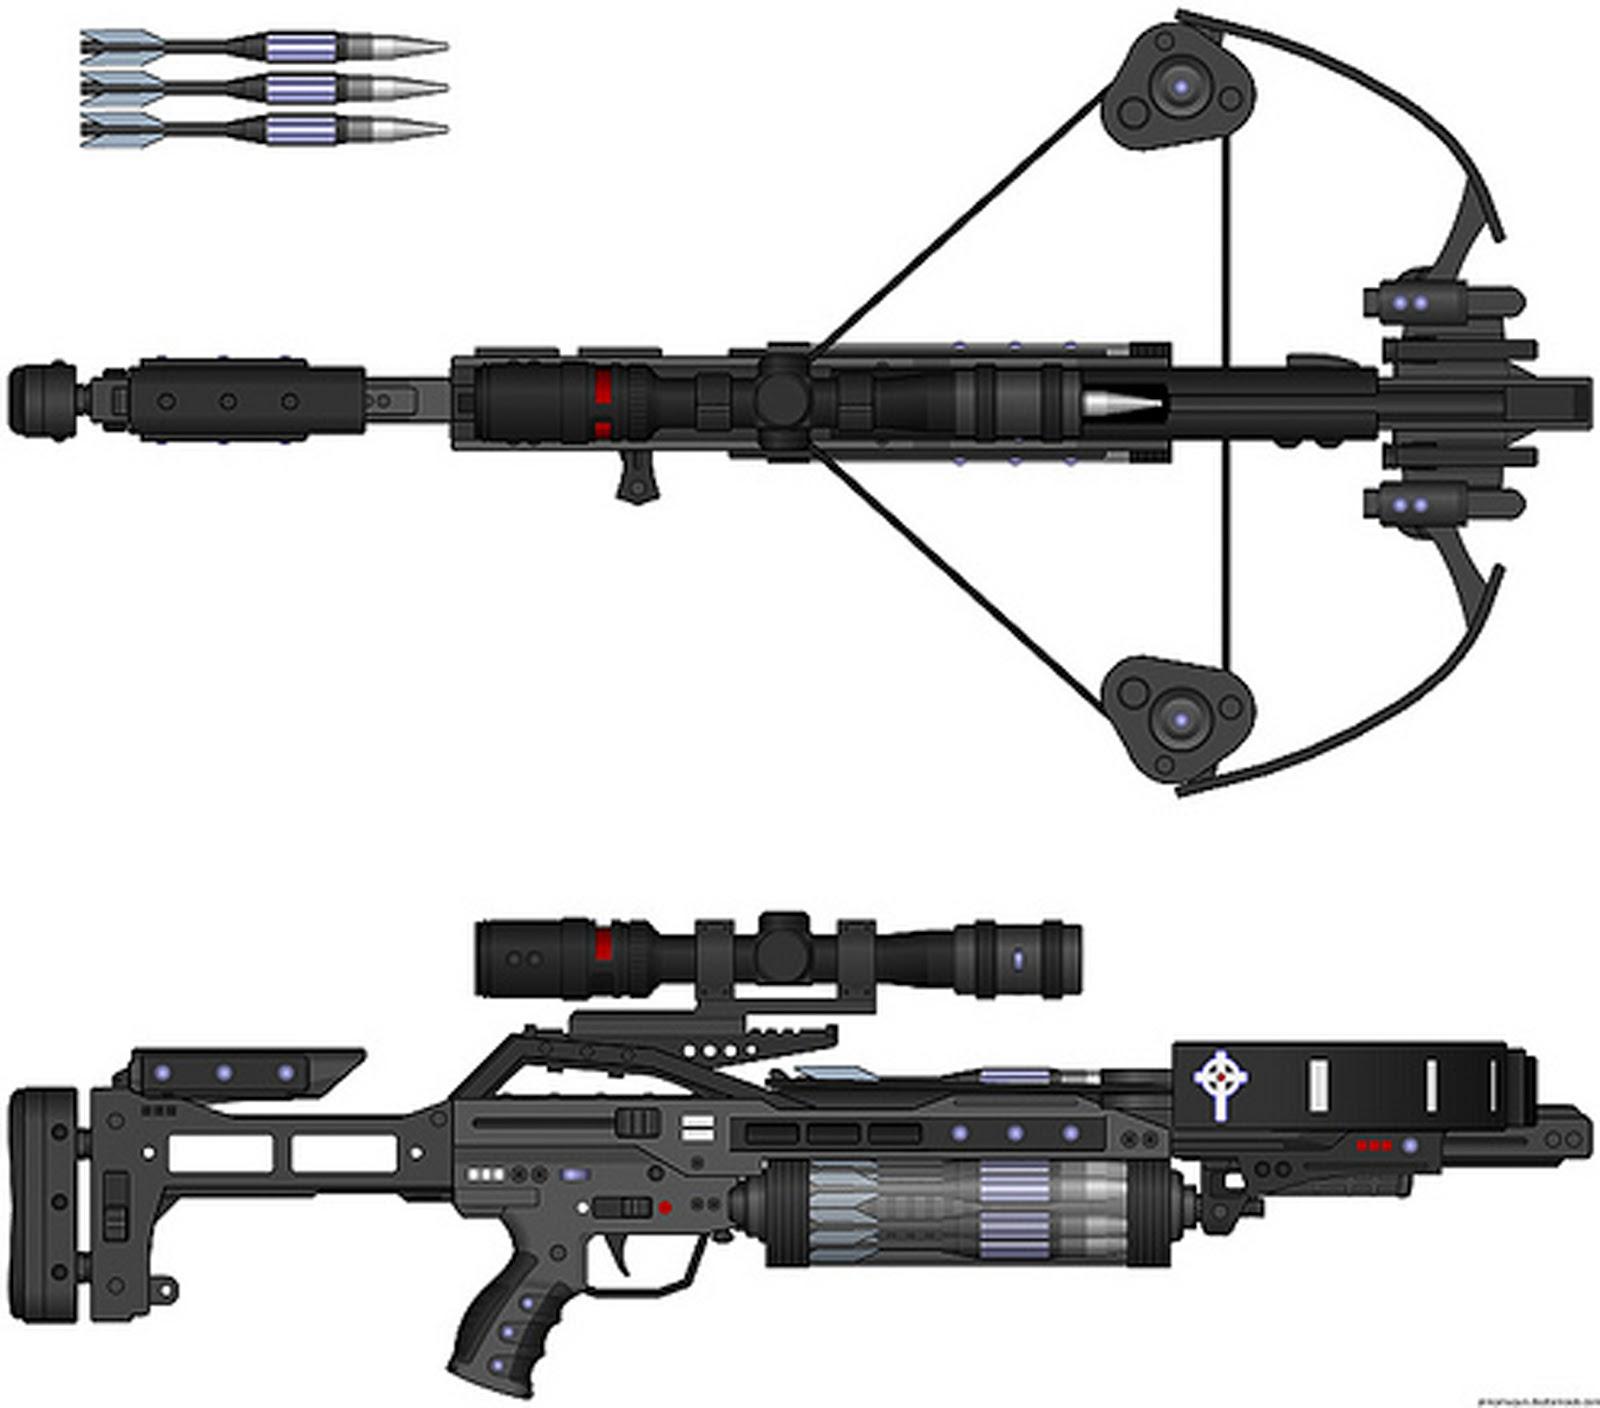 SCI FI GUNS  WEAPONS  HANDGUNS  LASER RIFLESVan Helsing Weapons